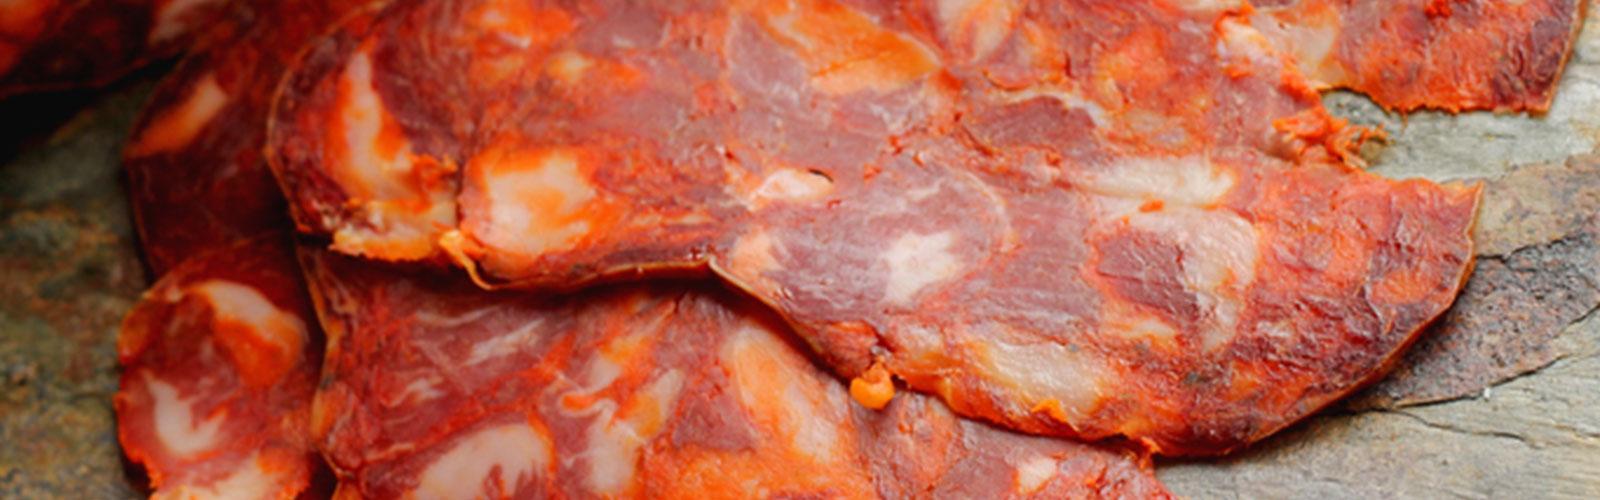 Somalo Sliced Chorizo Vela 100g